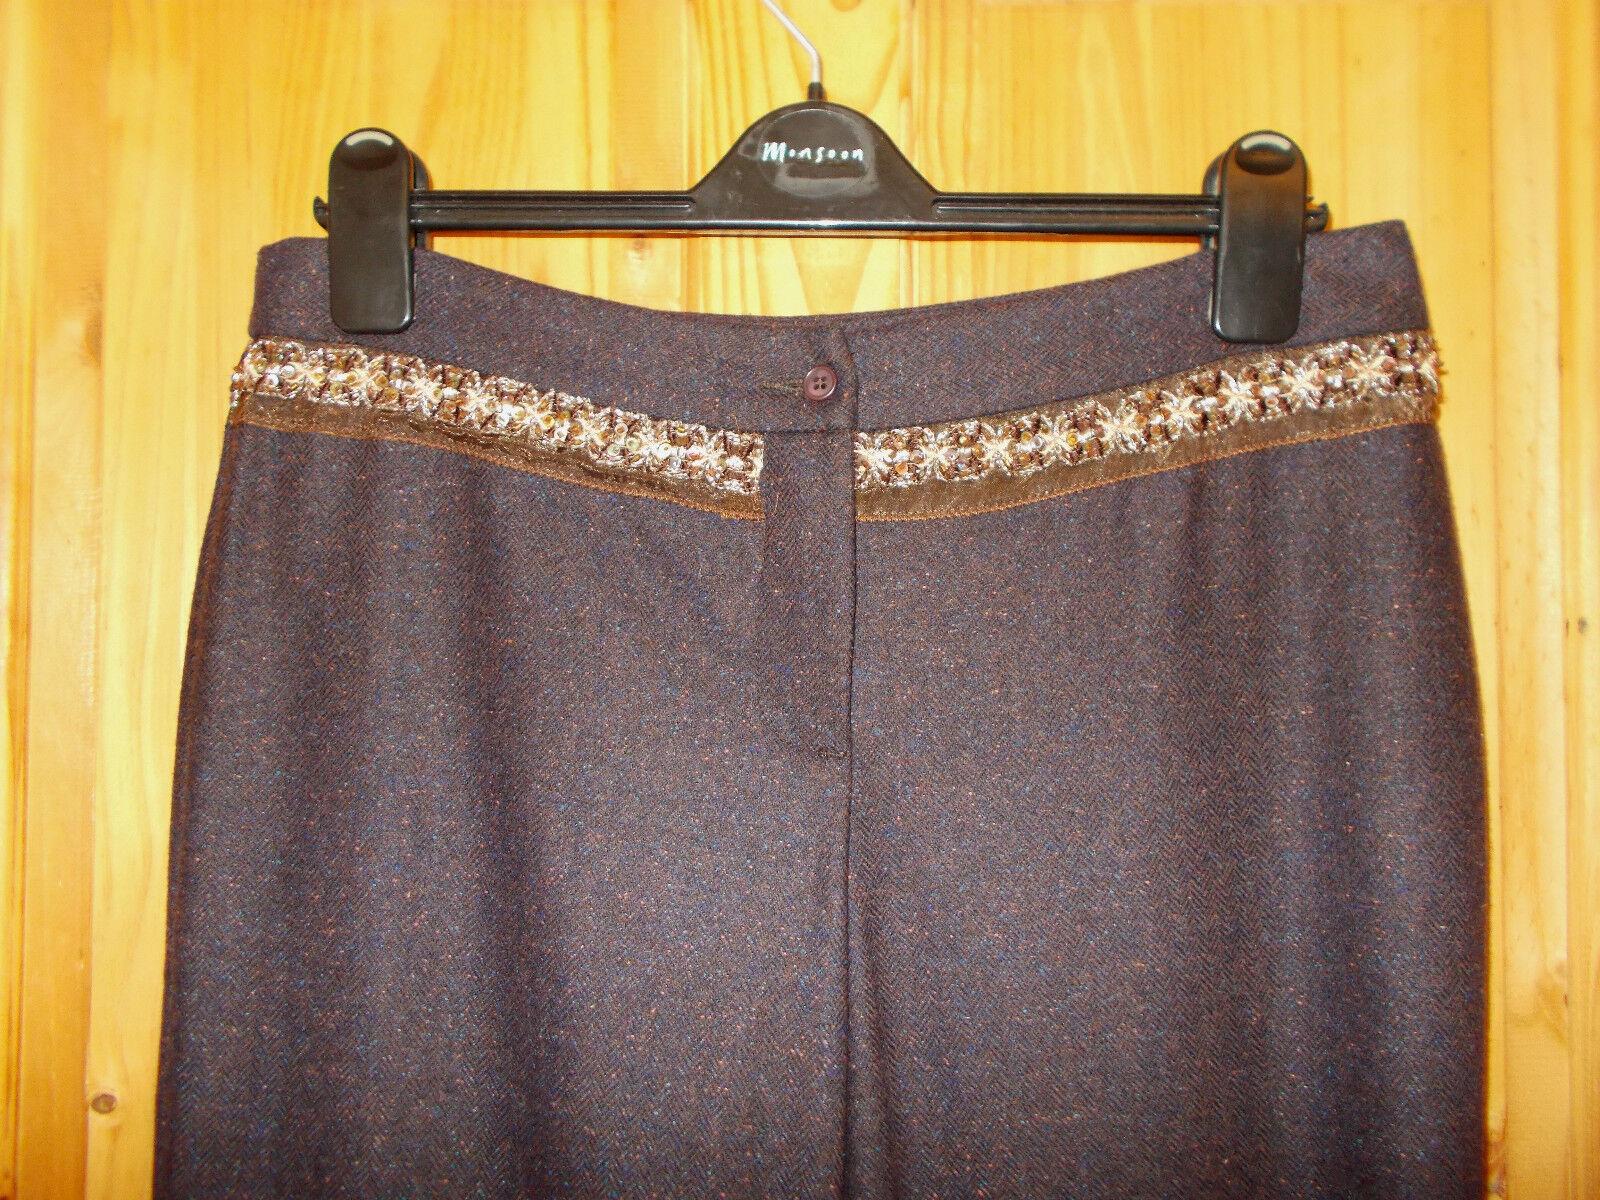 United coloreS OF BENETTON Marronee Marronee Marronee Viola Blu Arancione Lana Seta Pantaloni 44 10-12 946ccb